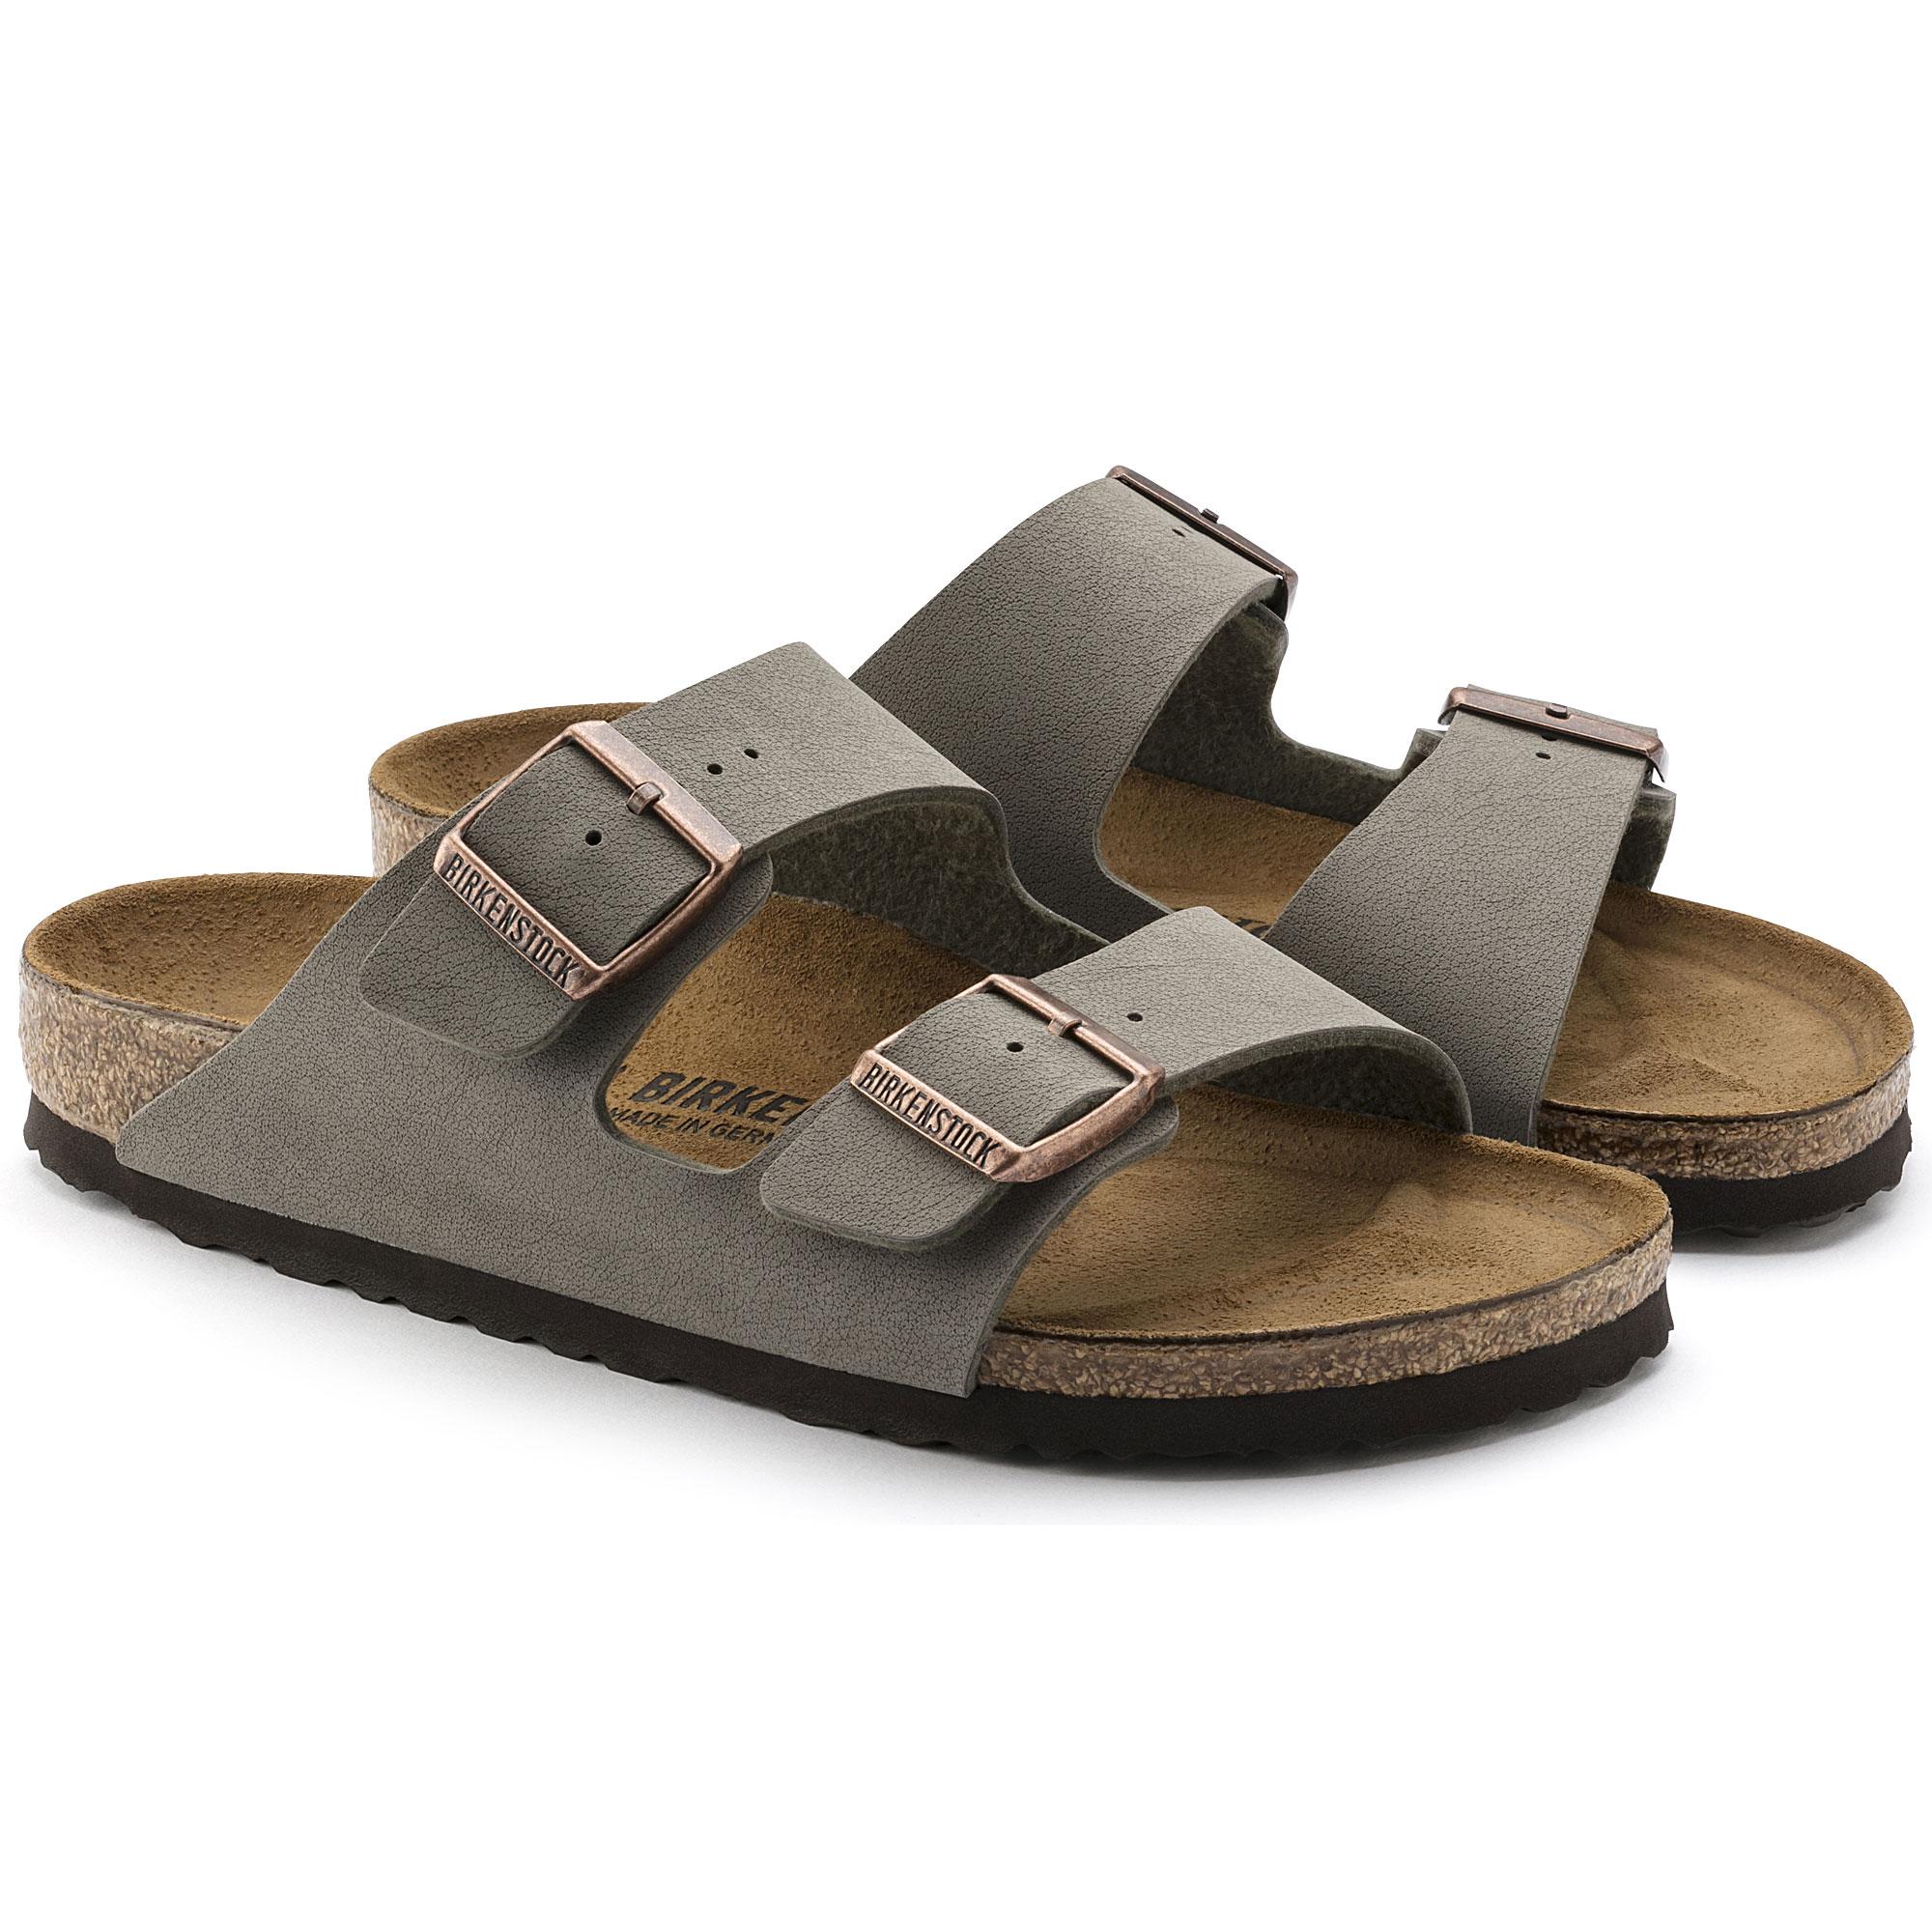 Birkenstock Arizona Sandals Many ColoursMaterials Slipper Slippers New